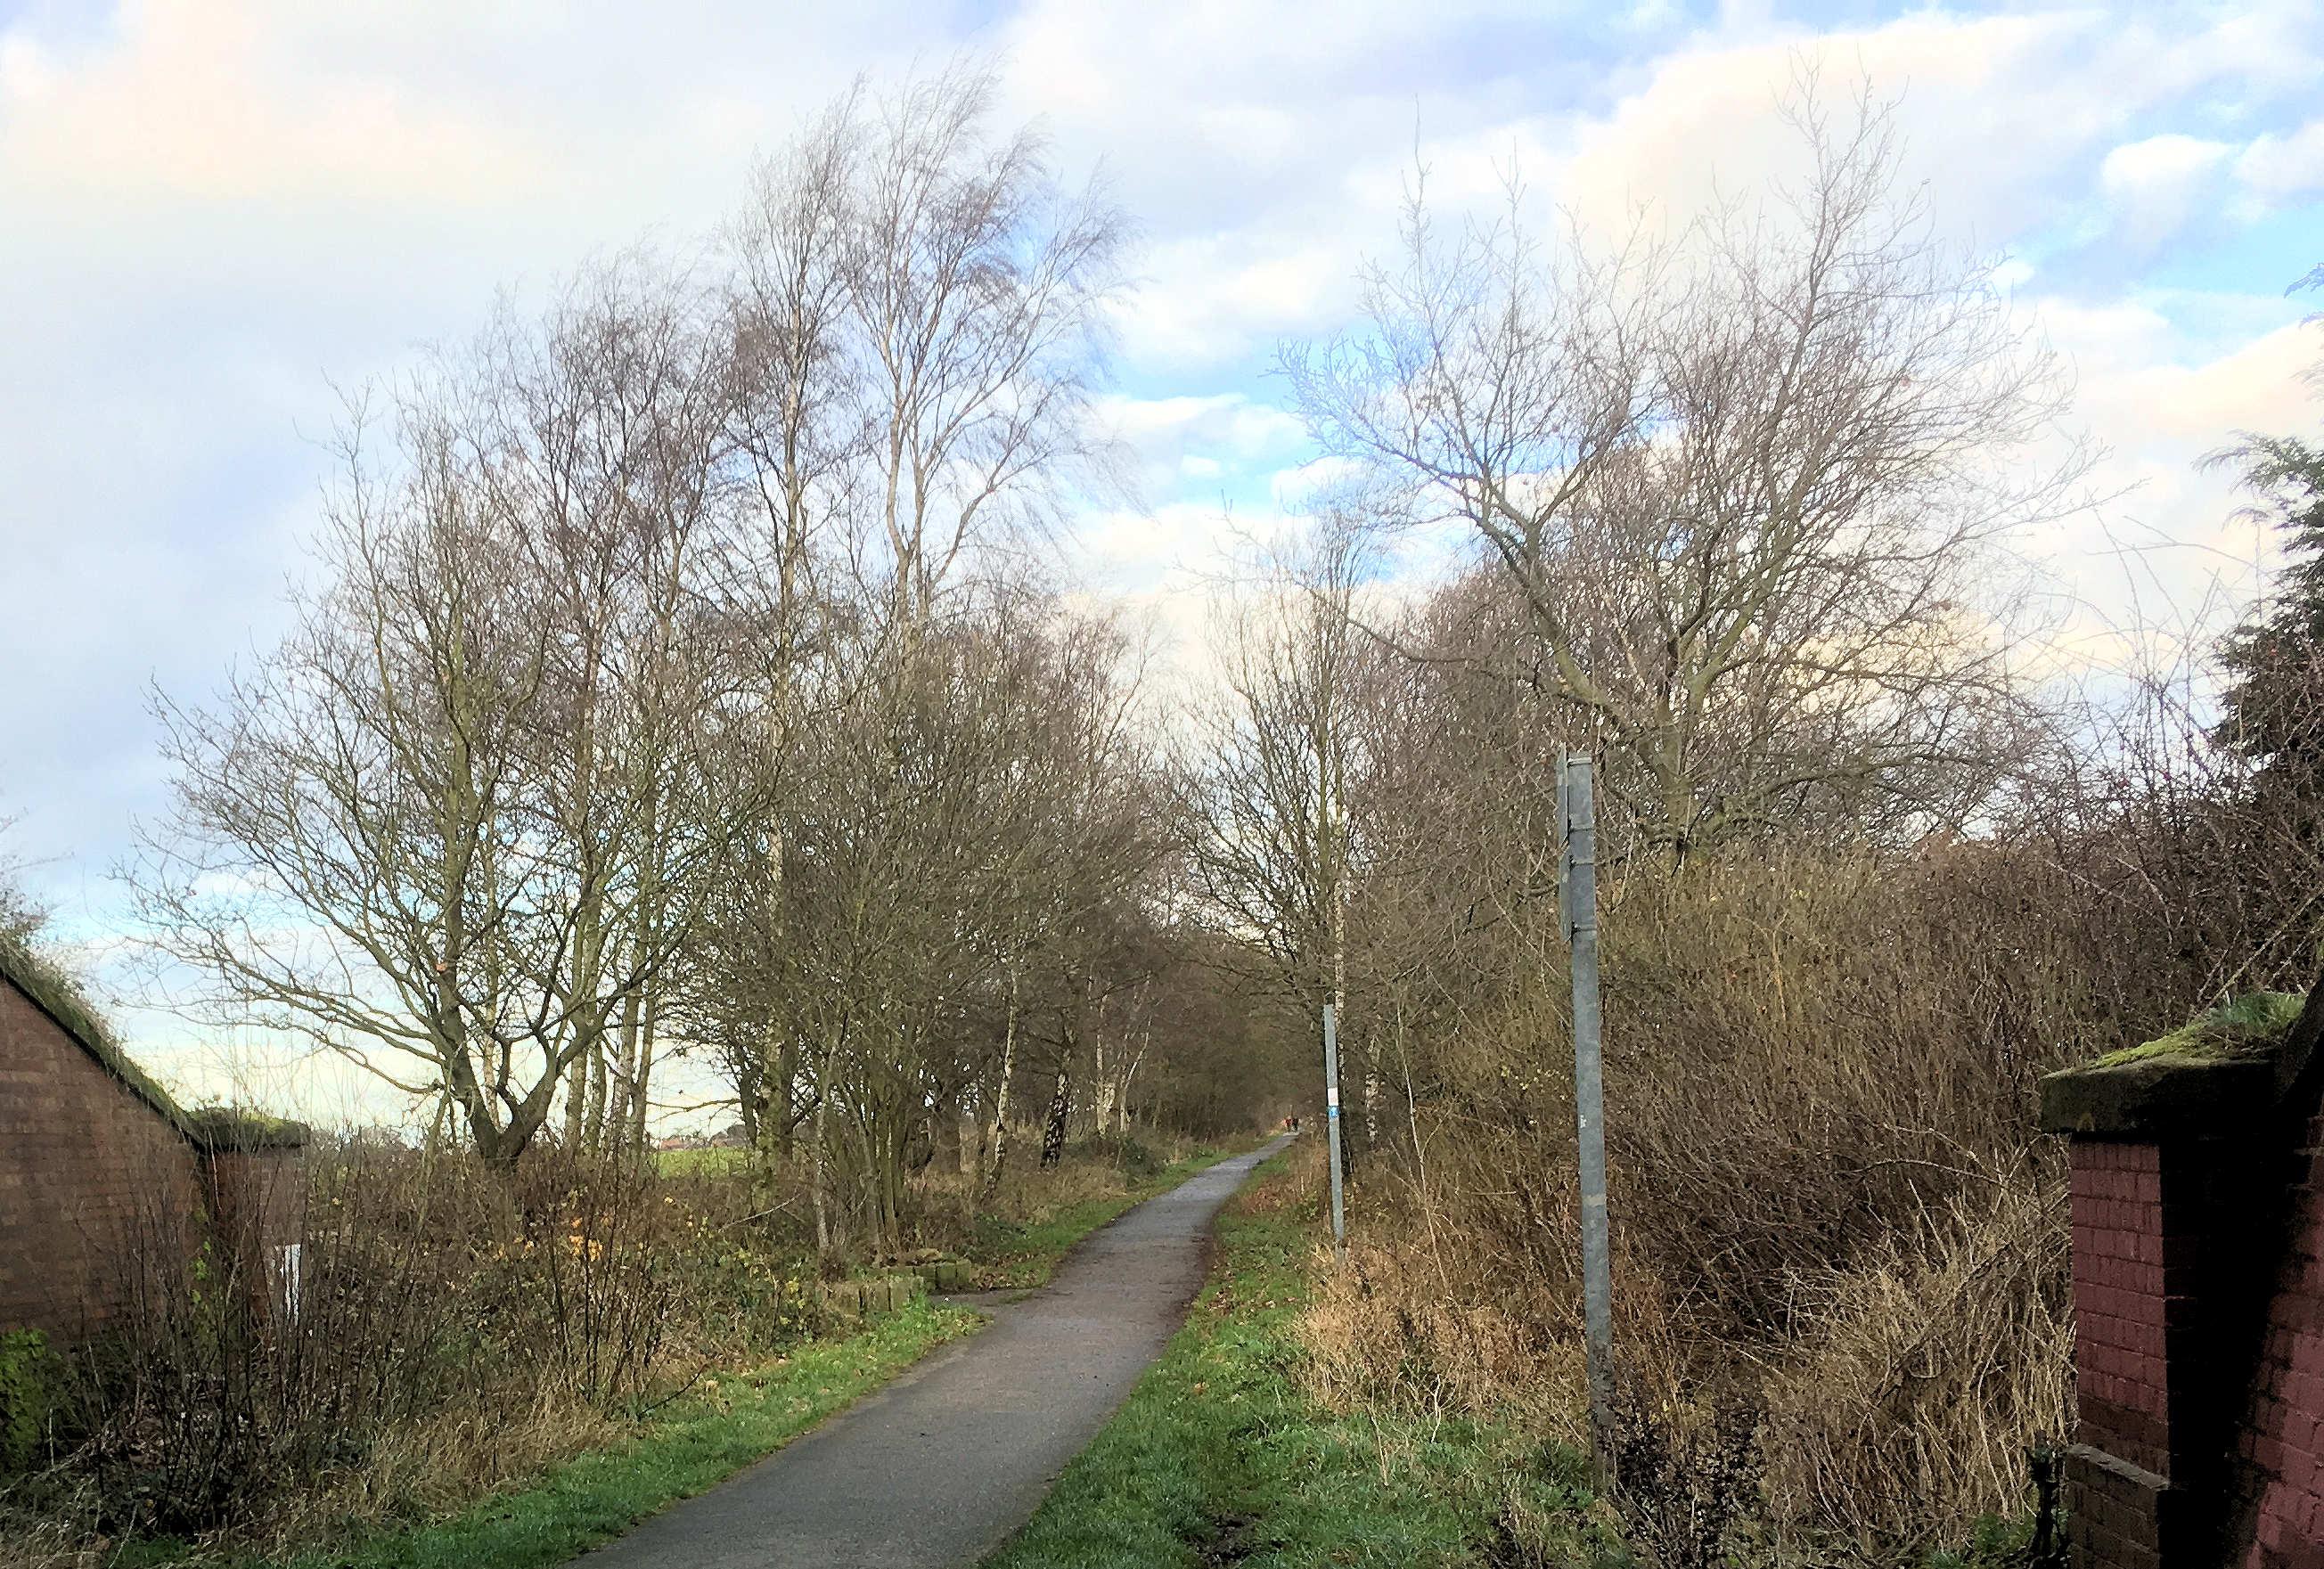 York - Selby cycle tarck 25th Dec 2016